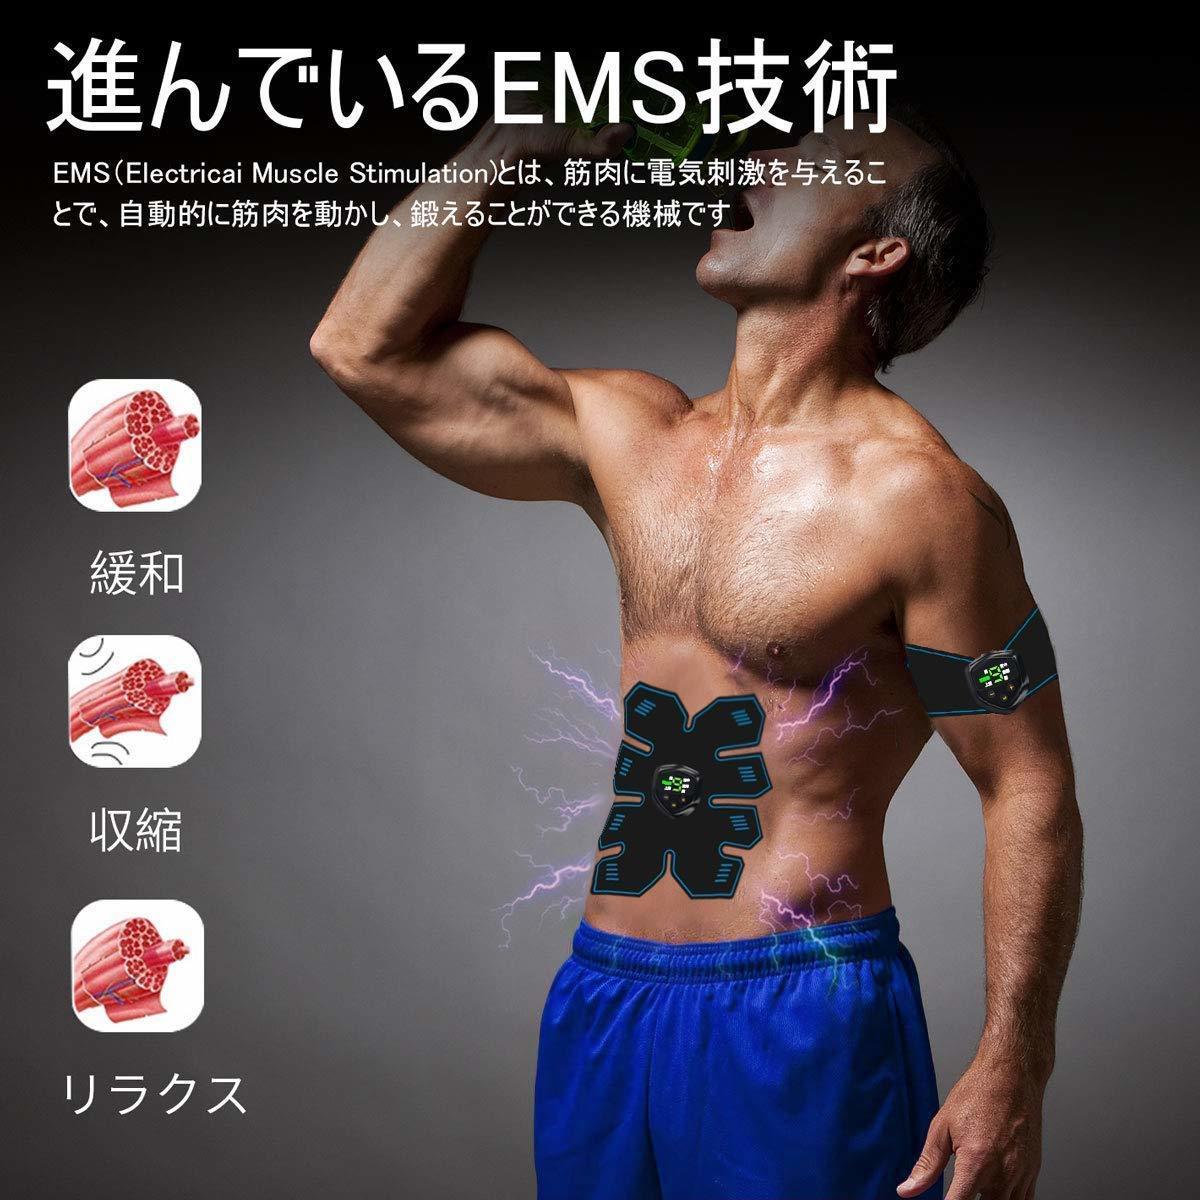 O593 新品 EMS 腹筋ベルト トレーニングベルト 筋トレ 腹筋パッド 腹筋ベルト 交換用ジェルシート12枚追加 USB充電式 日本語説明書付き_画像6